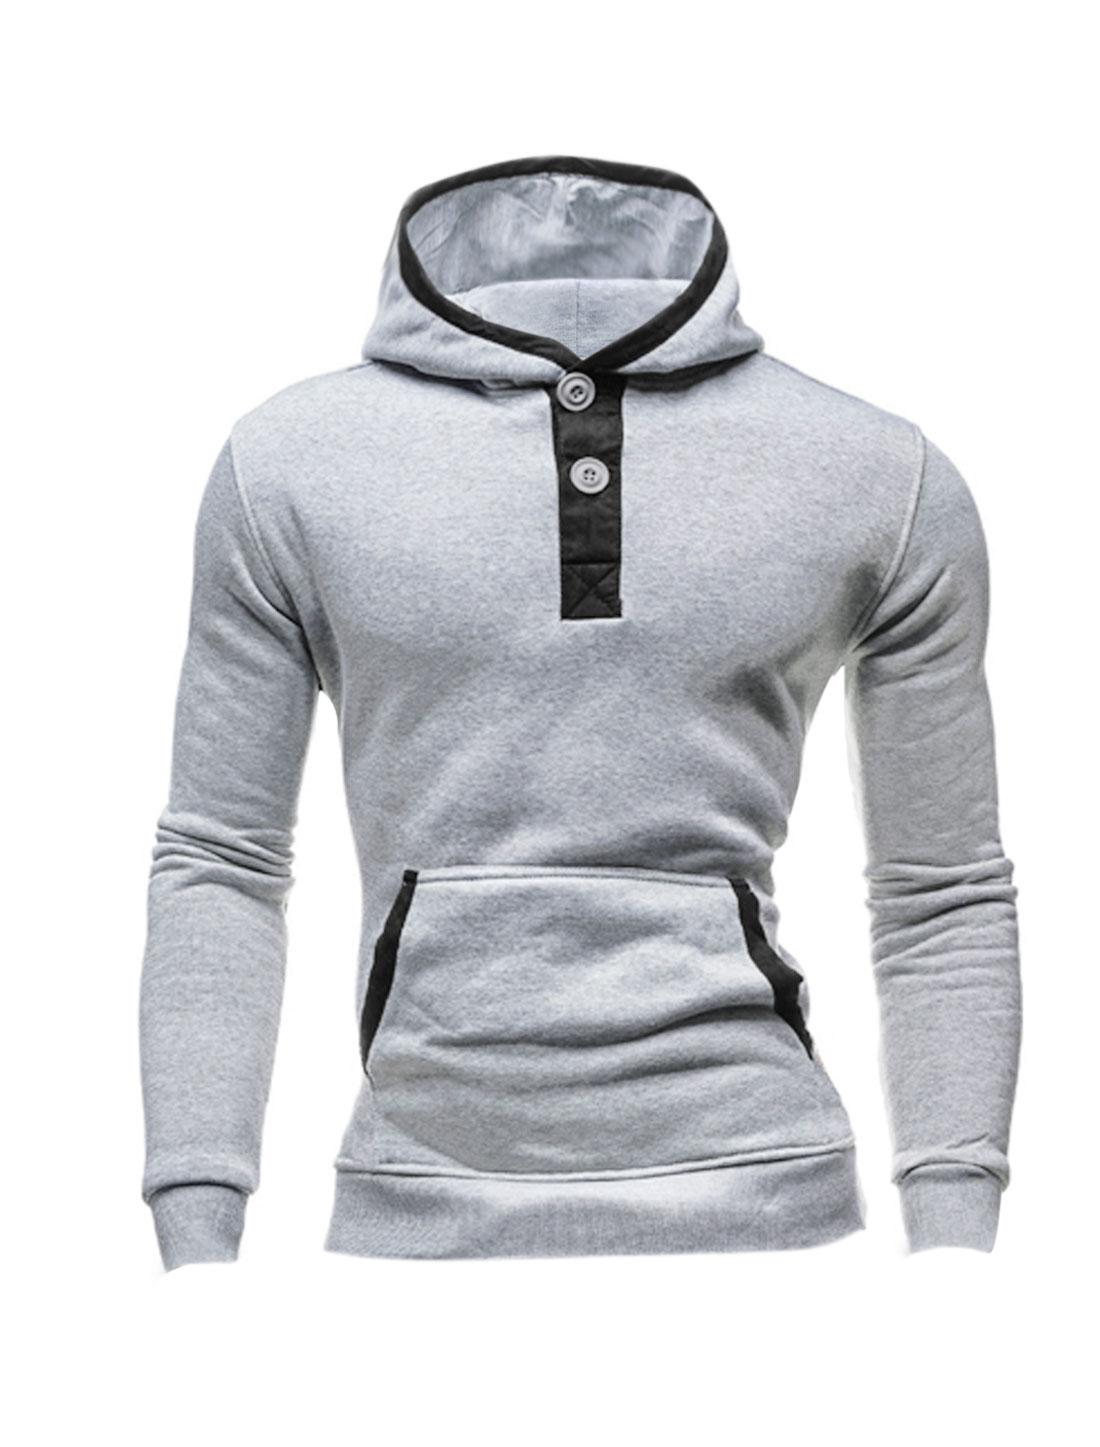 Men Long Sleeve Kangaroo Pocket Hooded Casual Sweatshirt Light Gray M